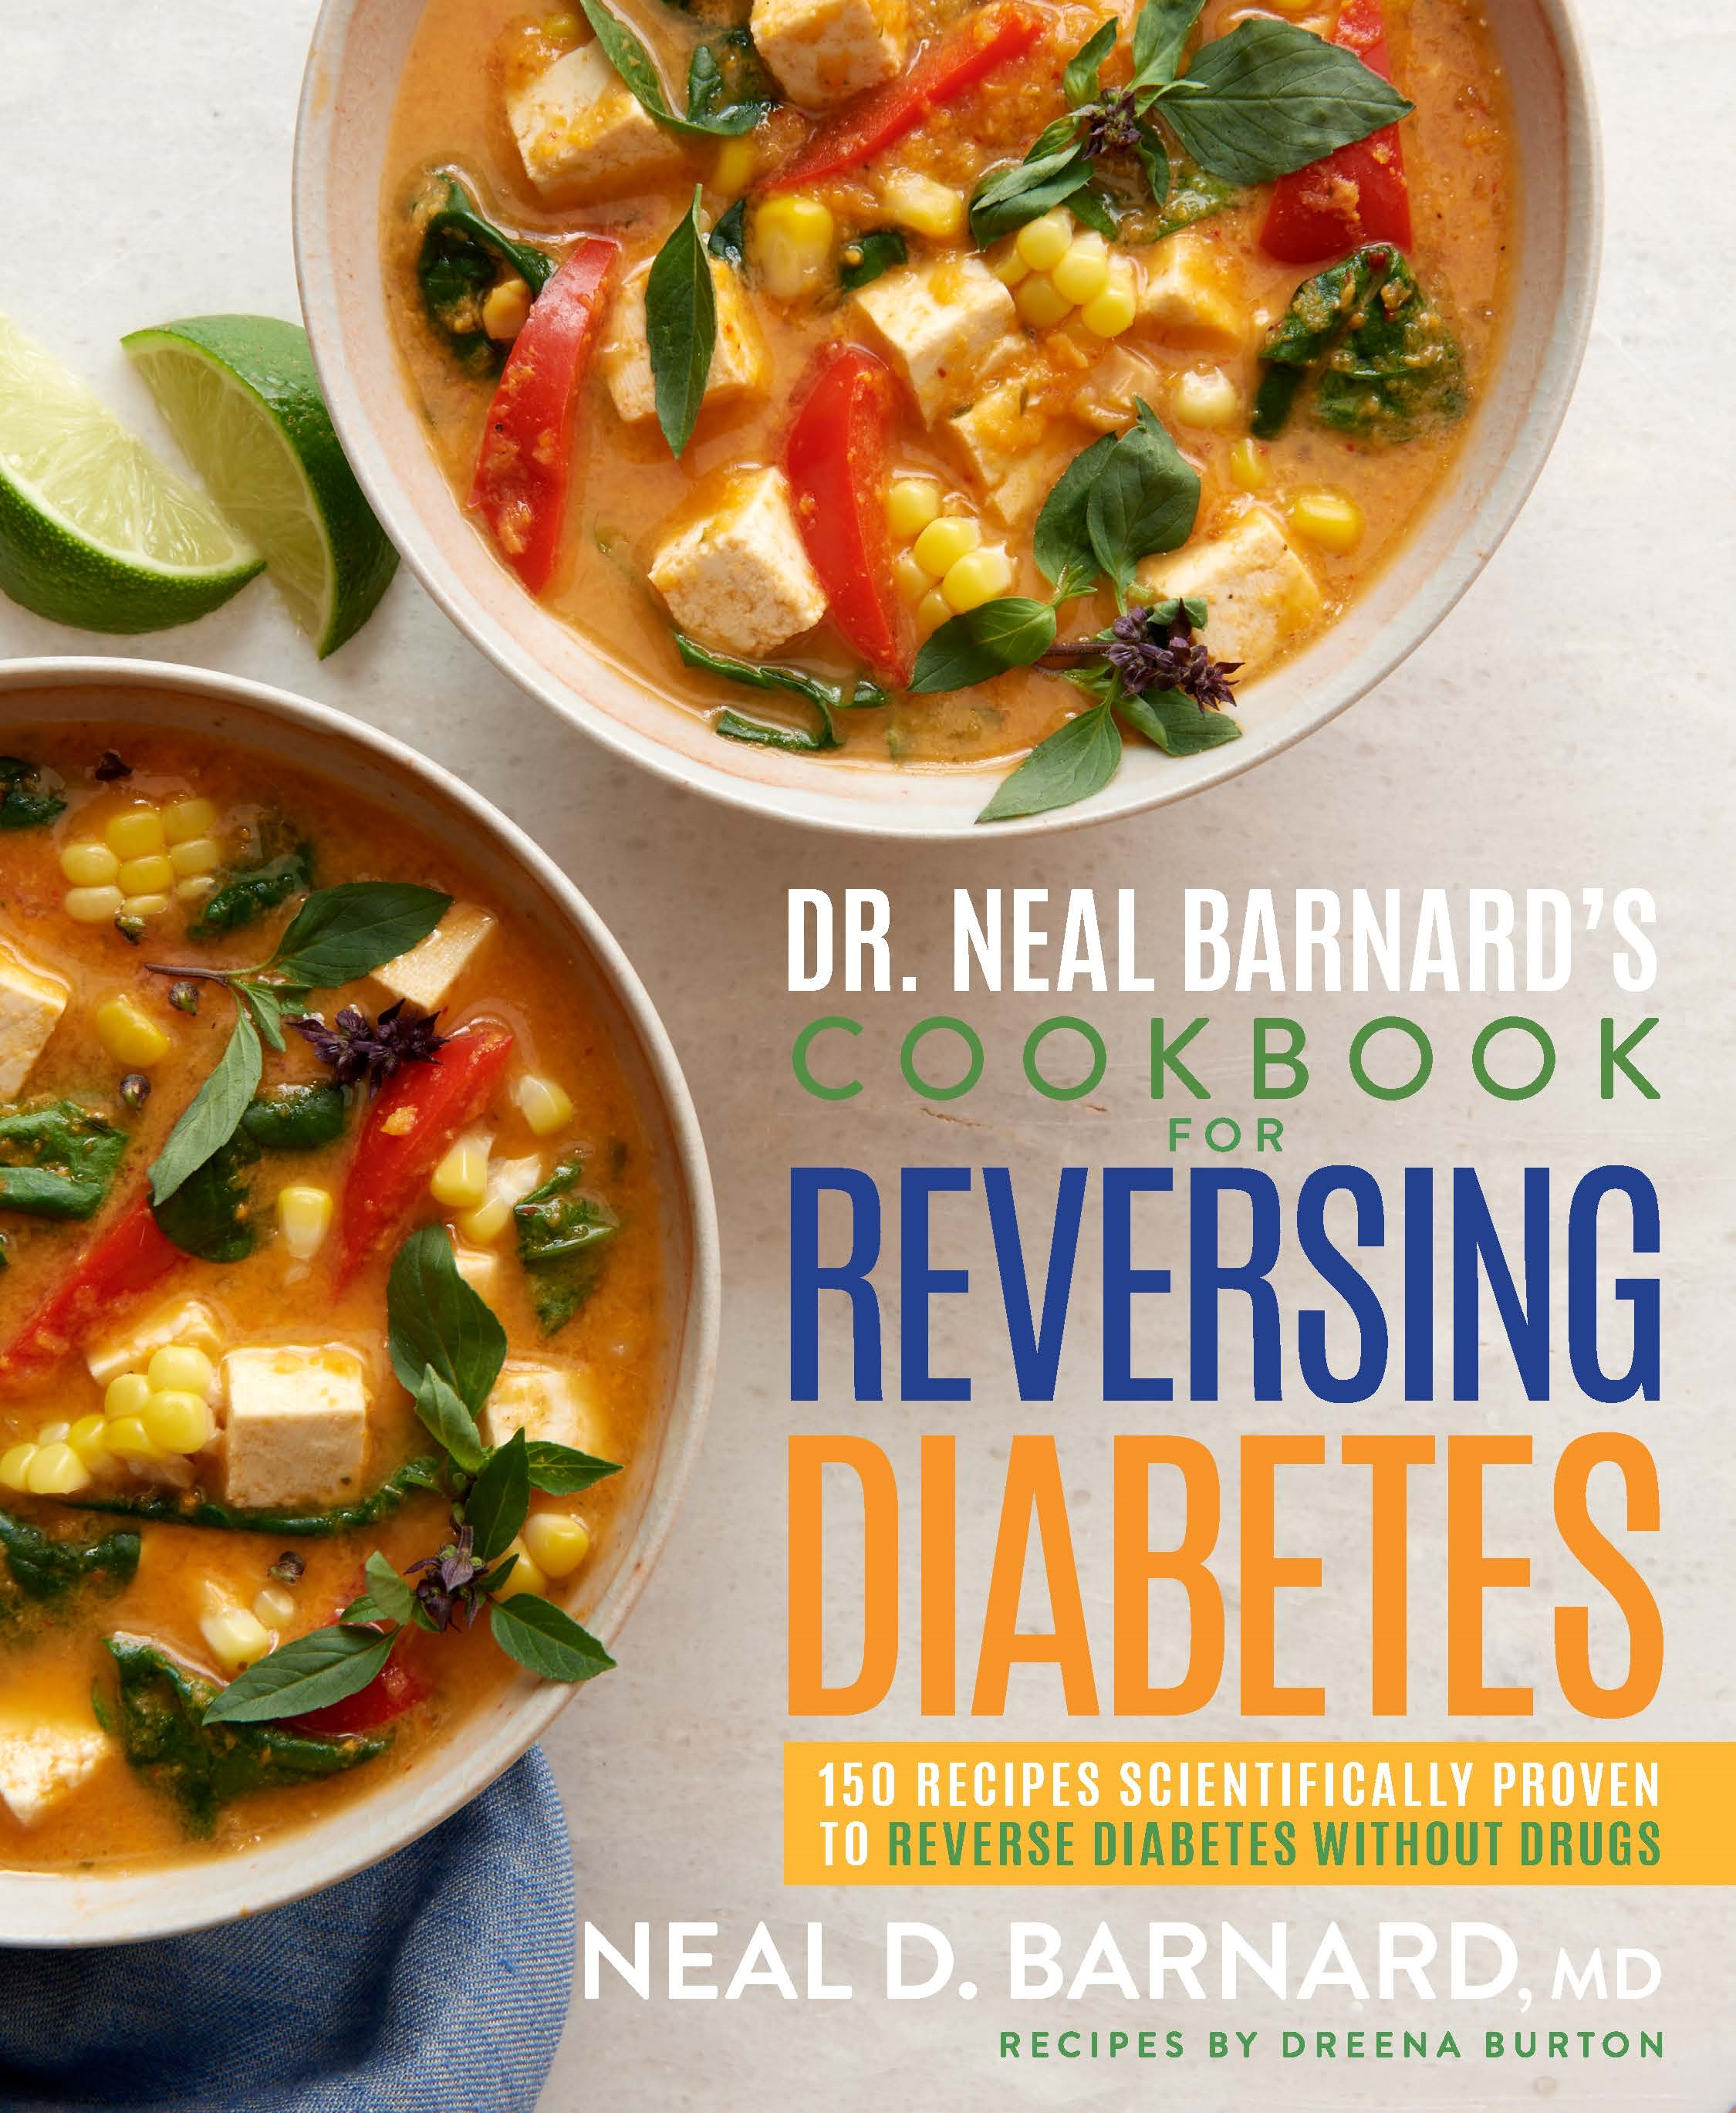 dr. barnard reverse diabetes diet